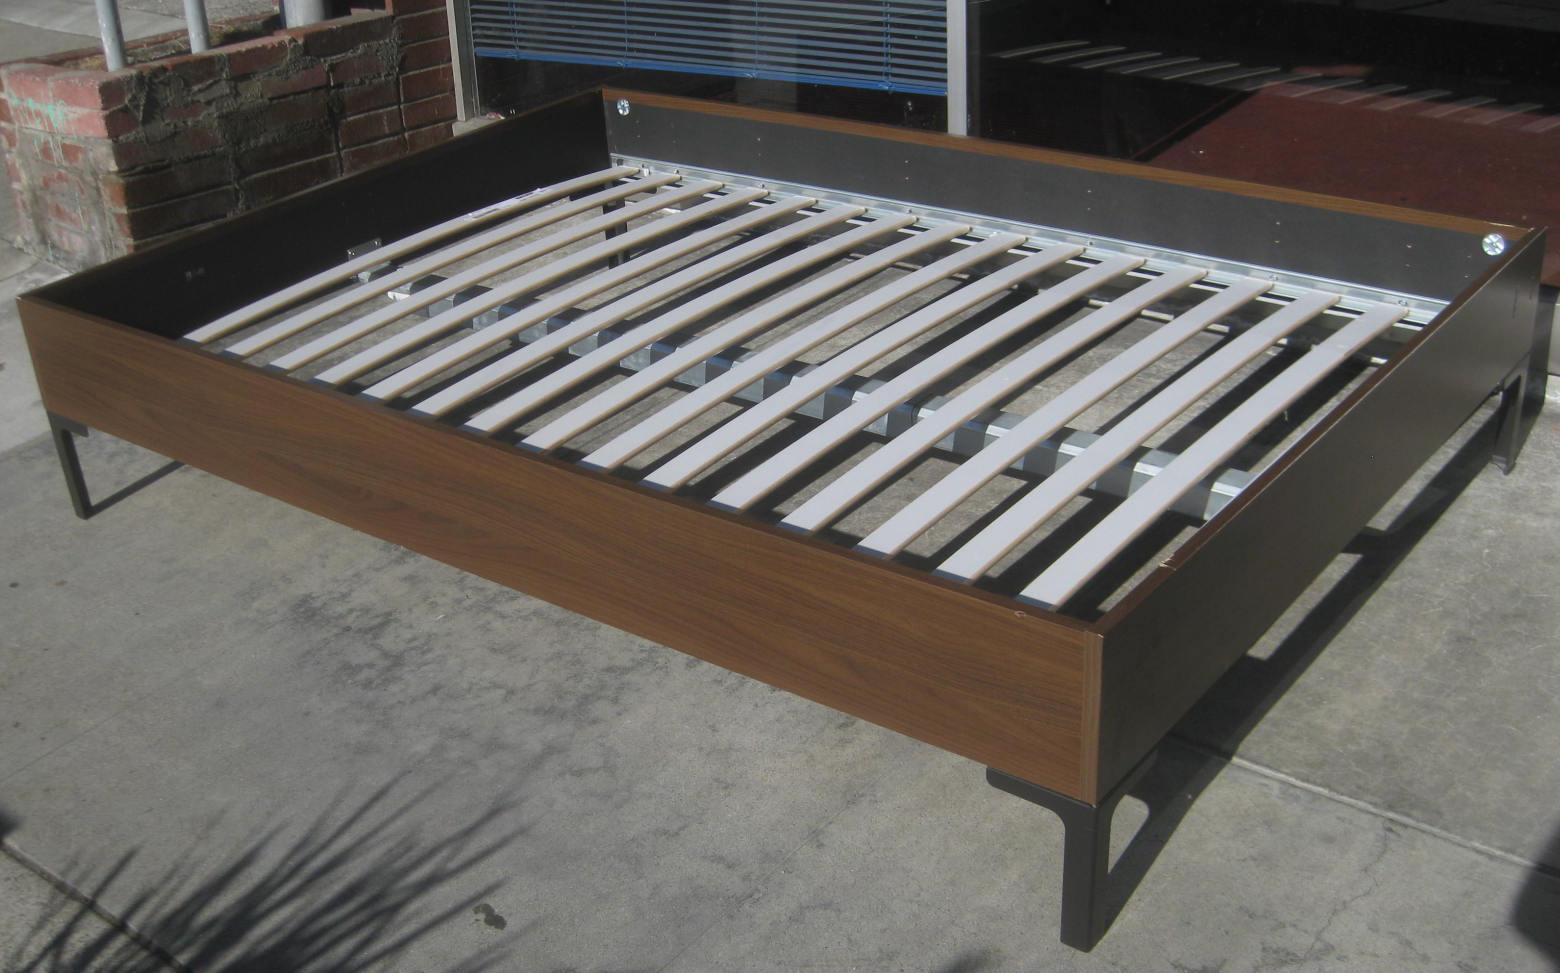 Uhuru Furniture Amp Collectibles Sold Full Ikea Platform